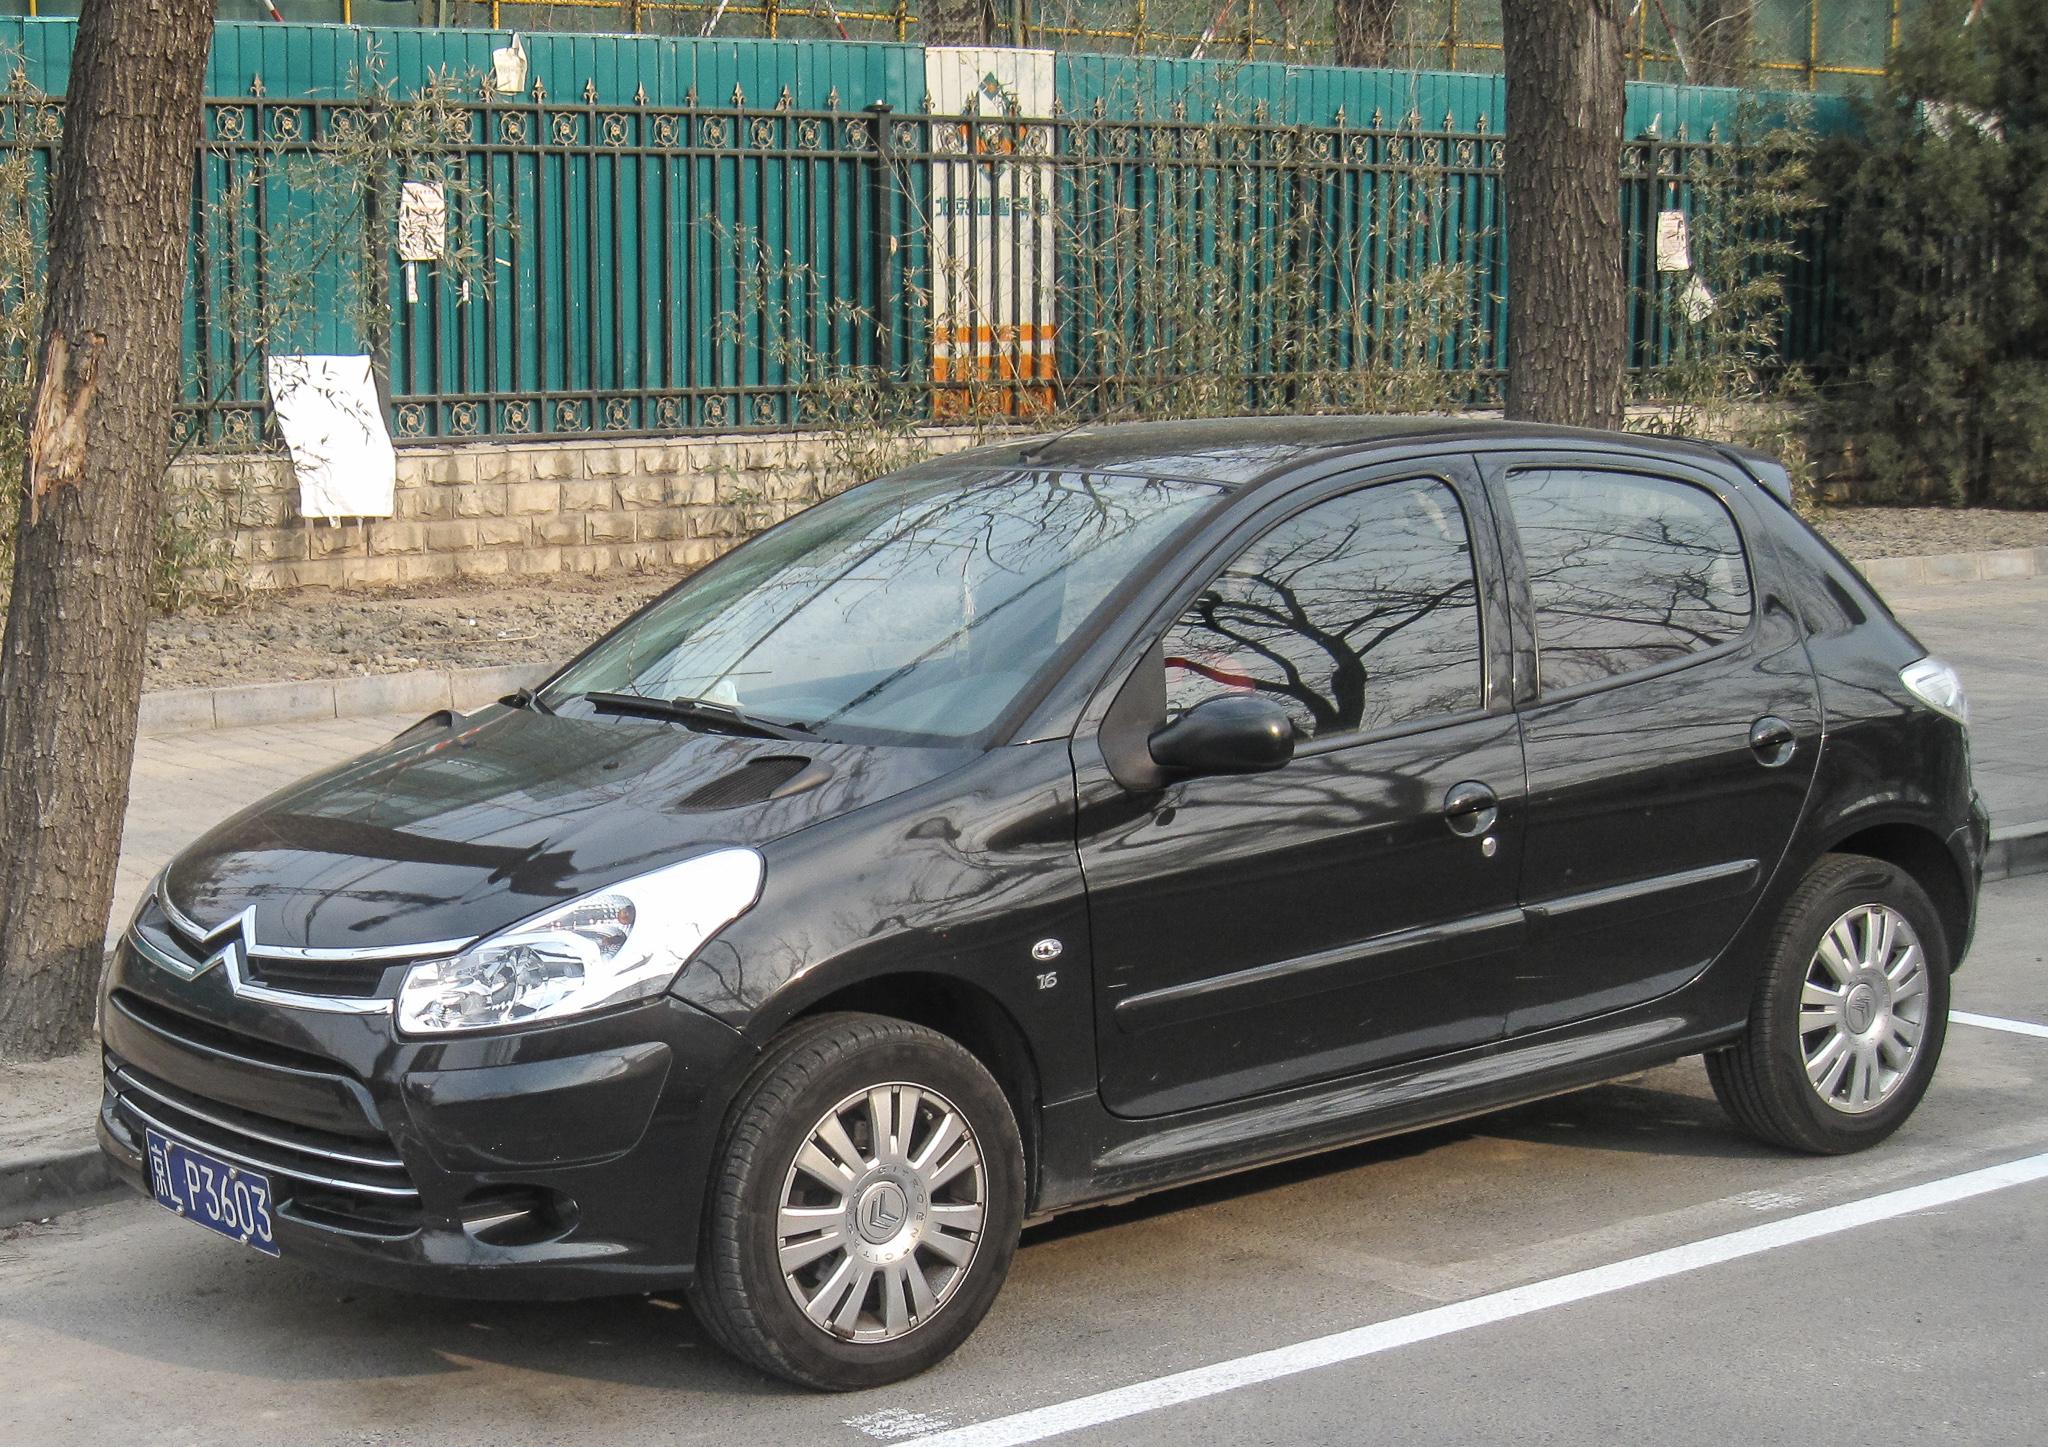 Citroën C2 | Cars of Beijing